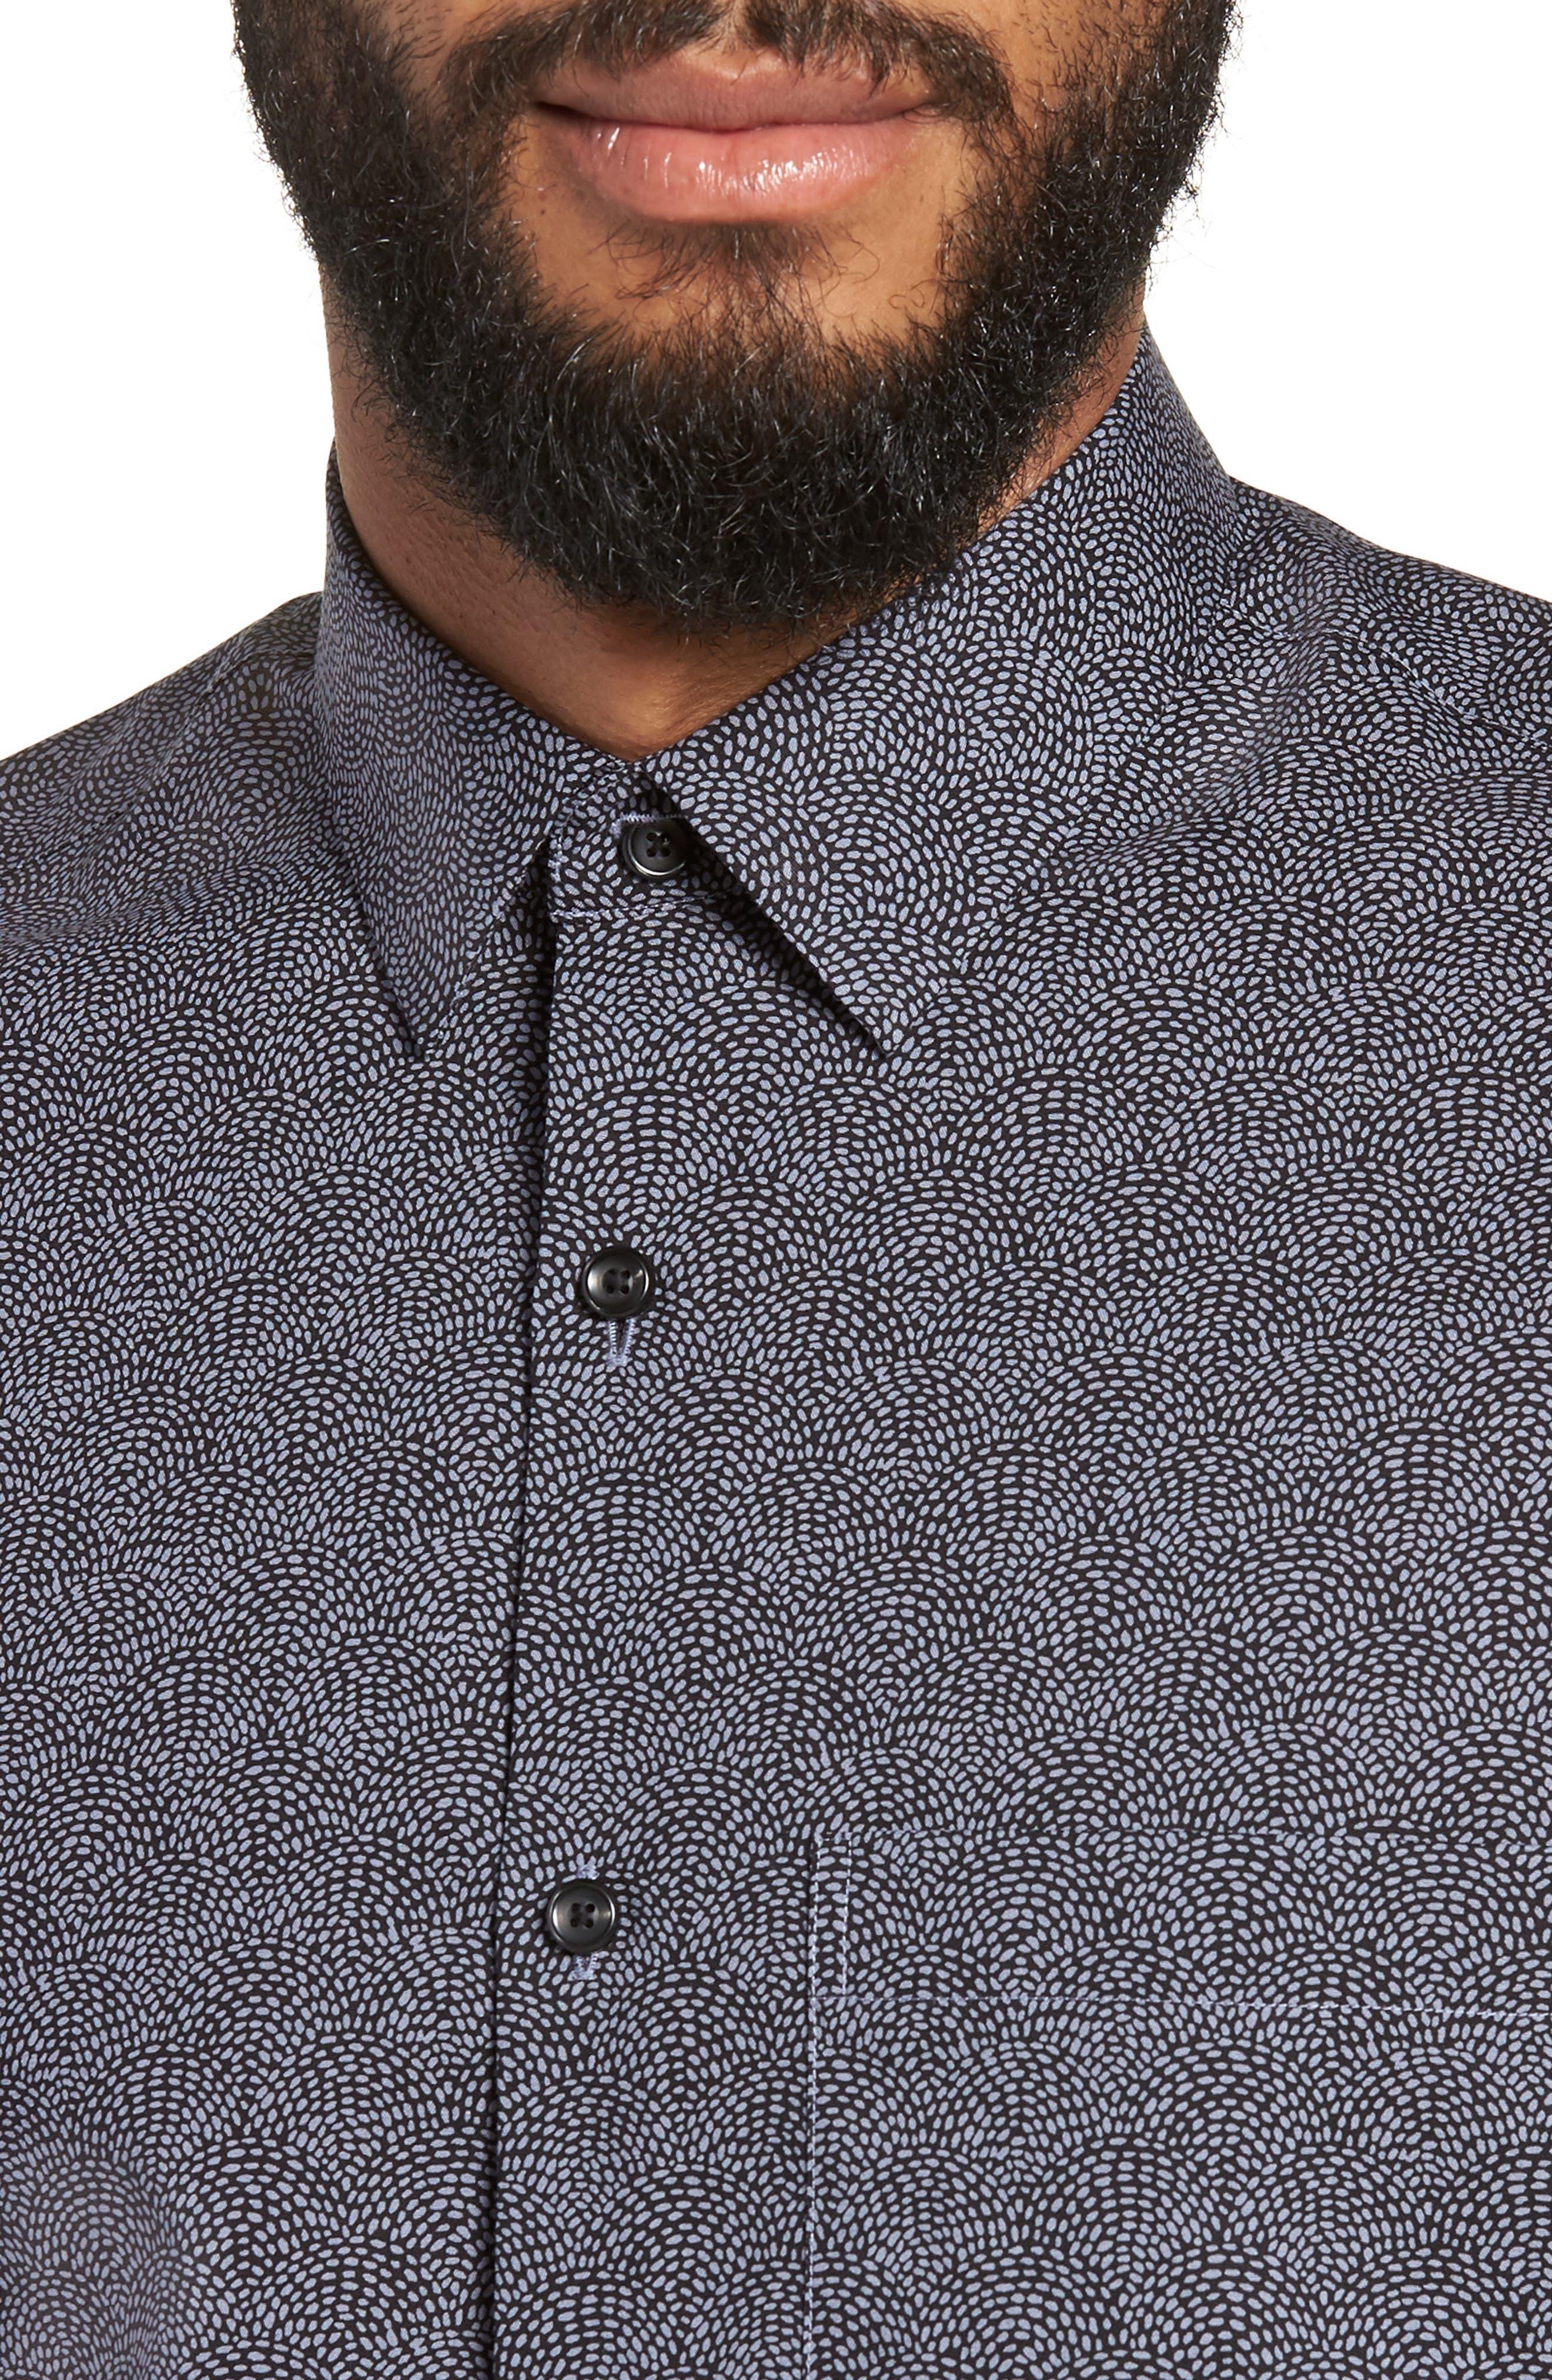 Slim Fit Print Non-Iron Sport Shirt,                             Alternate thumbnail 4, color,                             GREY FOLKSTONE BLACK DOT